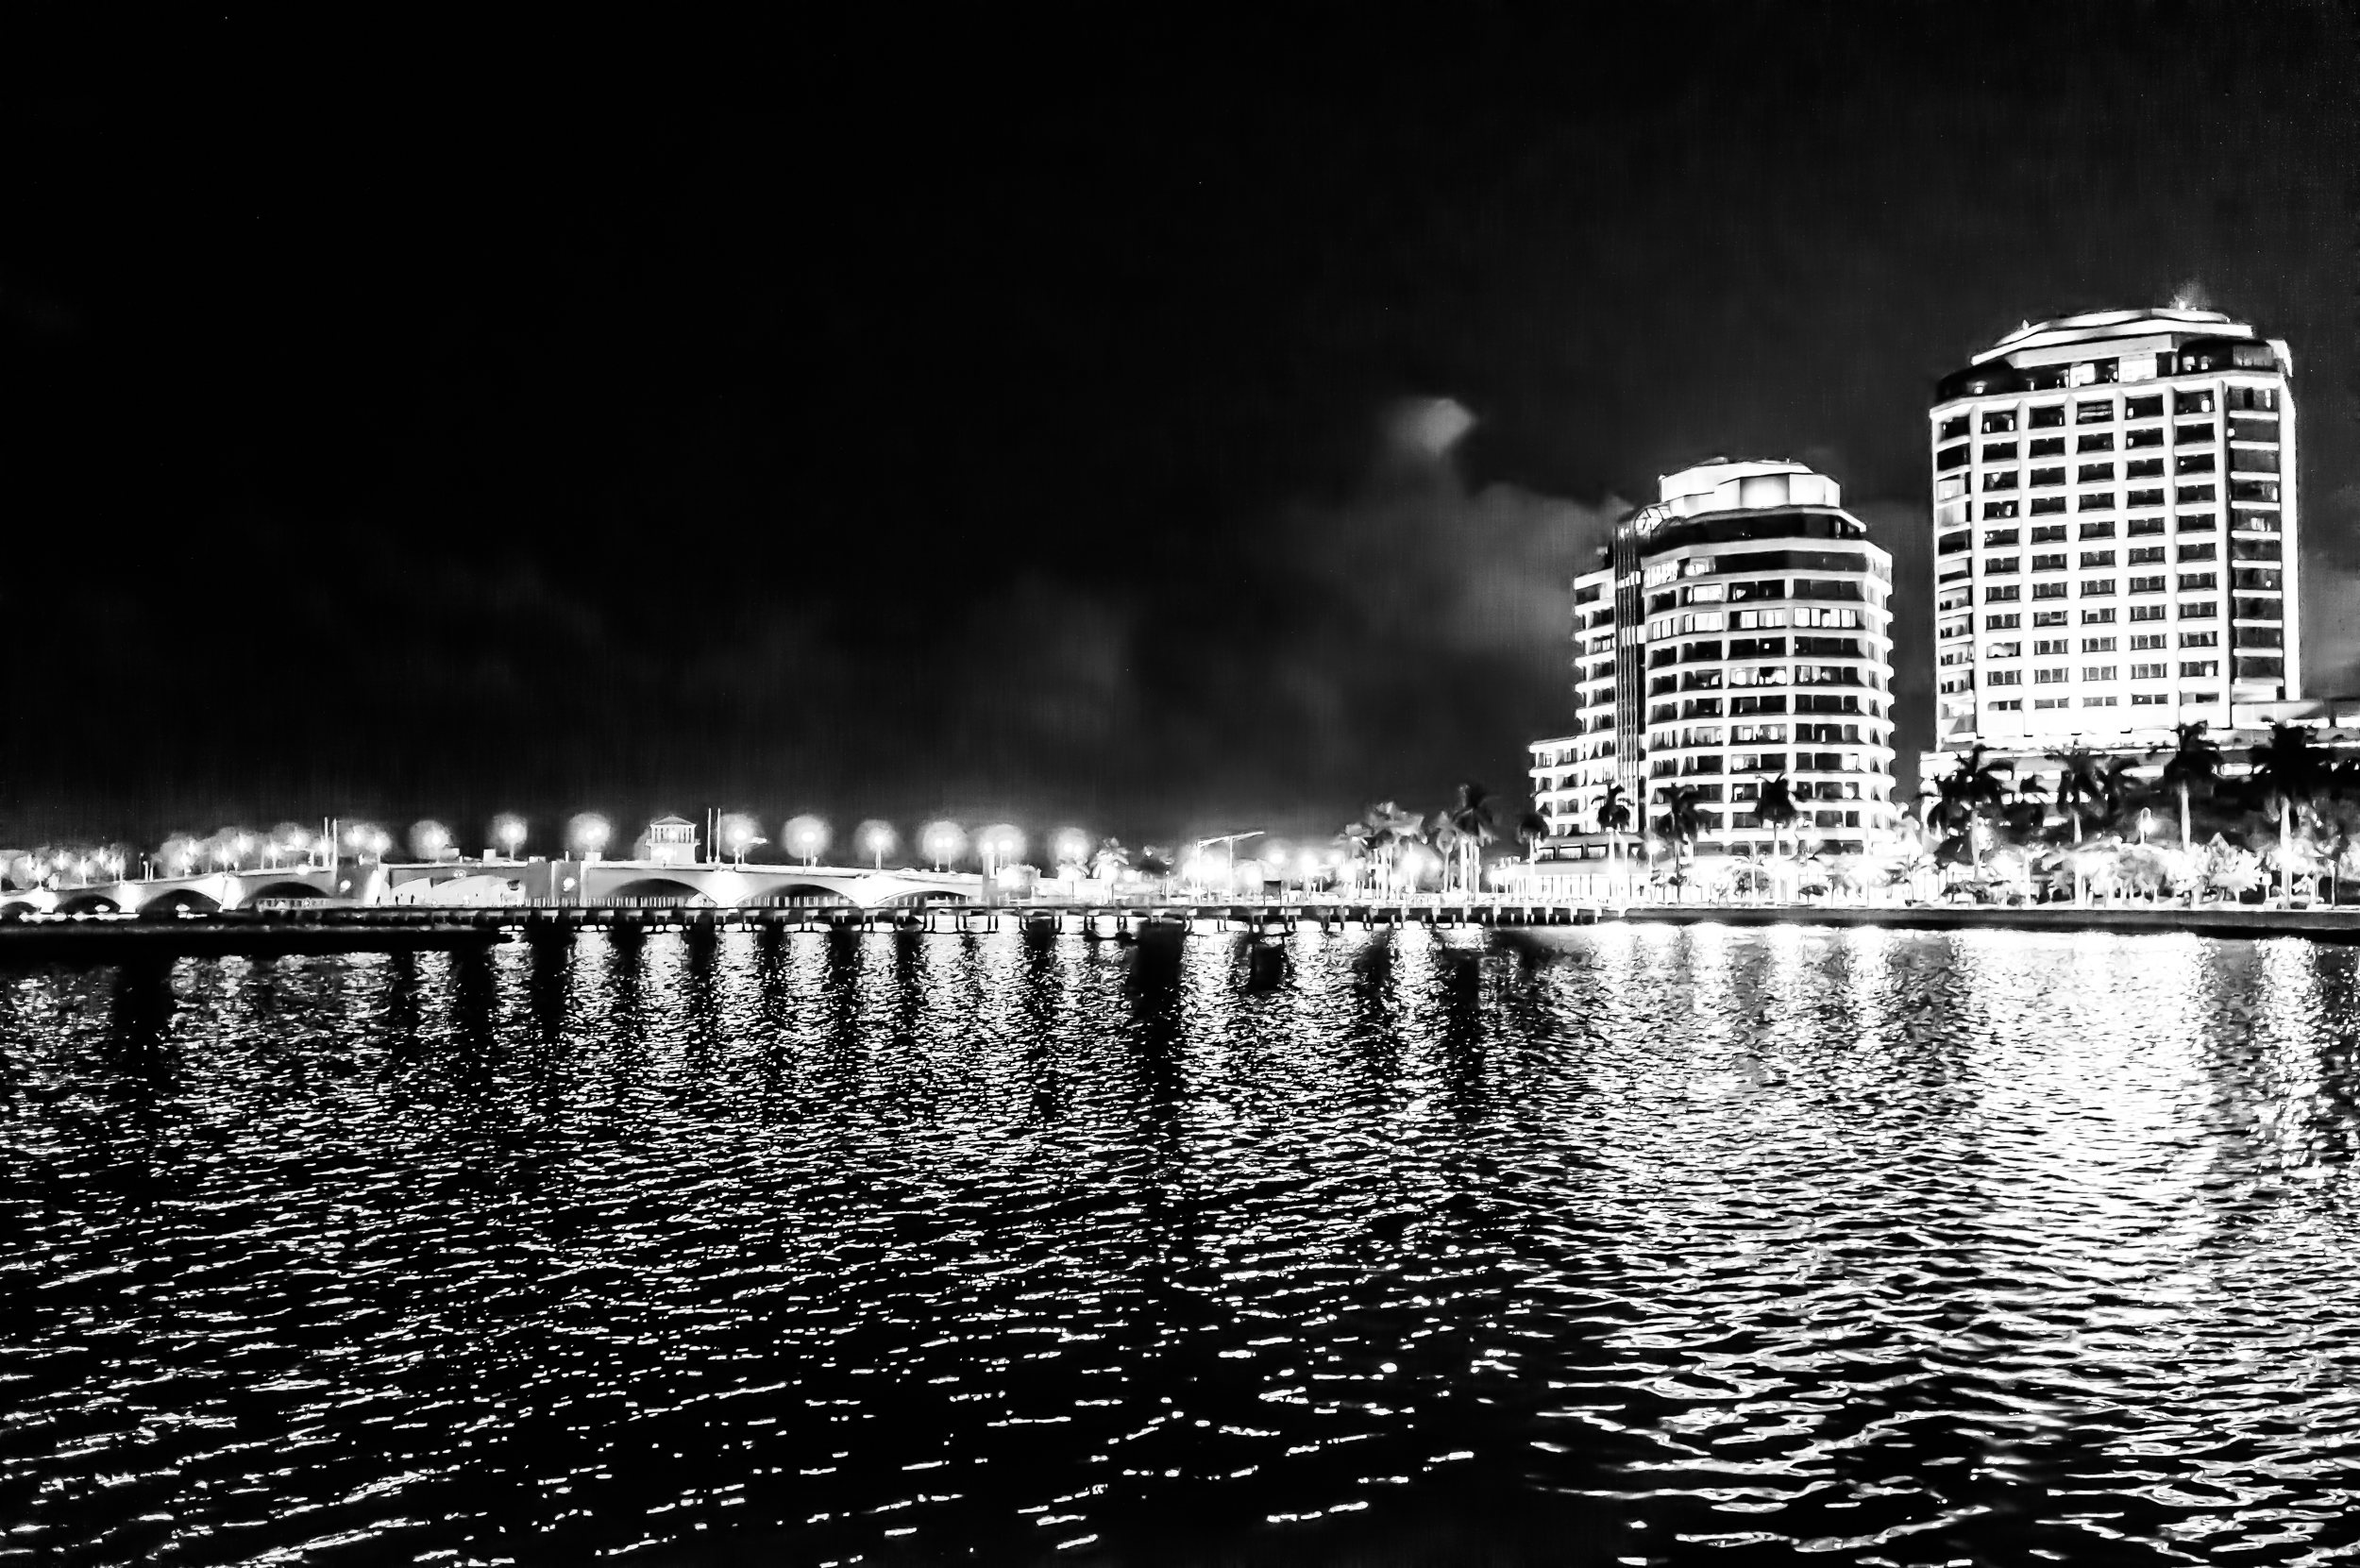 Florida-55-November 16, 2014.jpg